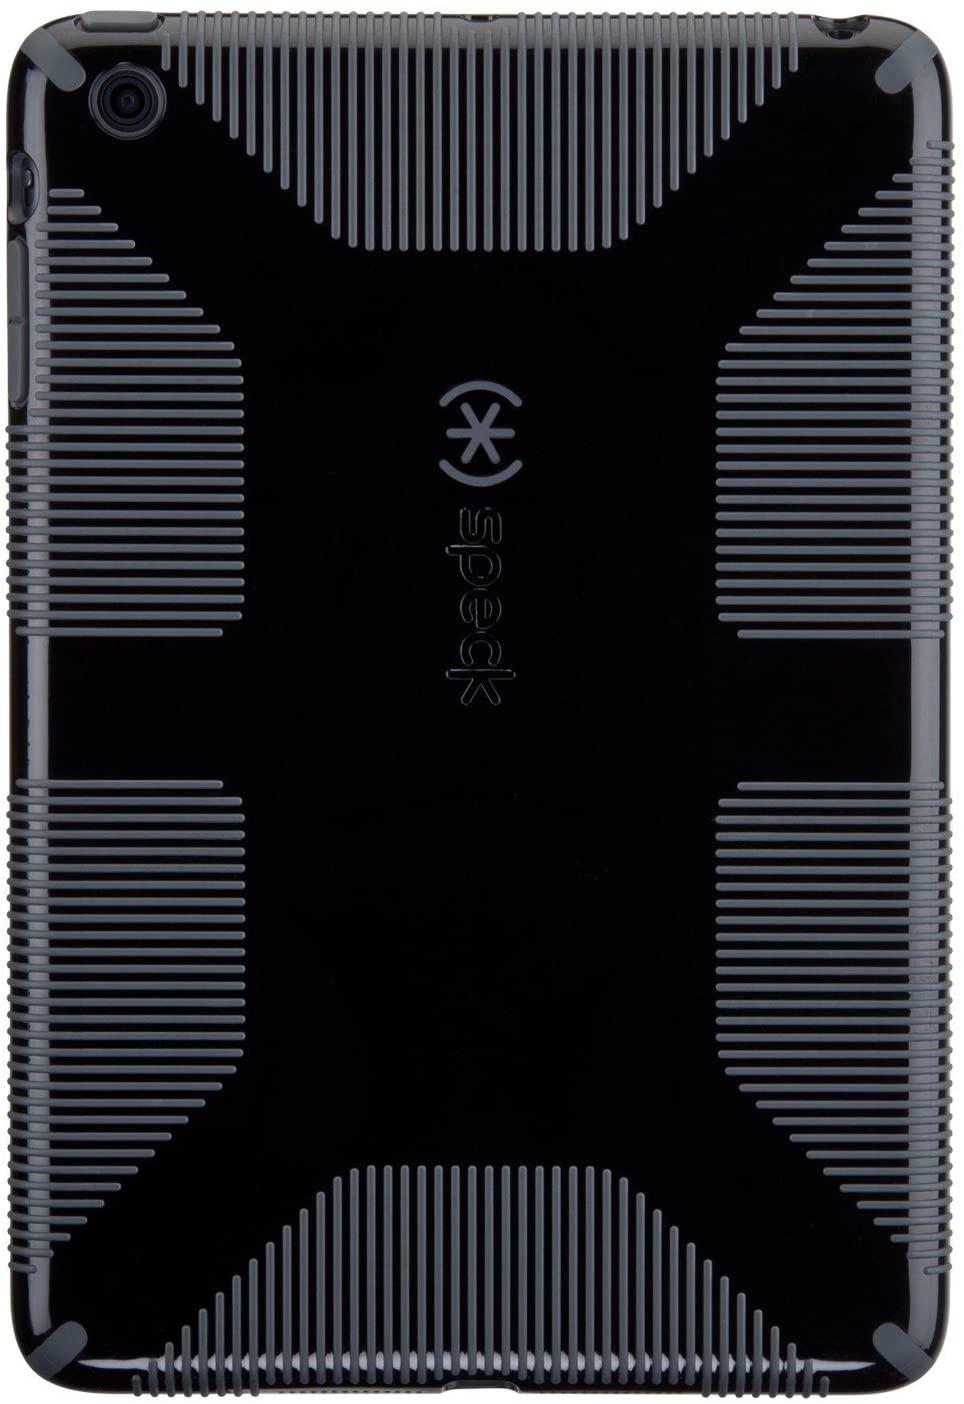 Speck (SPK-A1961) Candyshell Grip Case for Ipad Mini 3 Cases (Also Fits Mini 2 and Mini) - Black/Slate